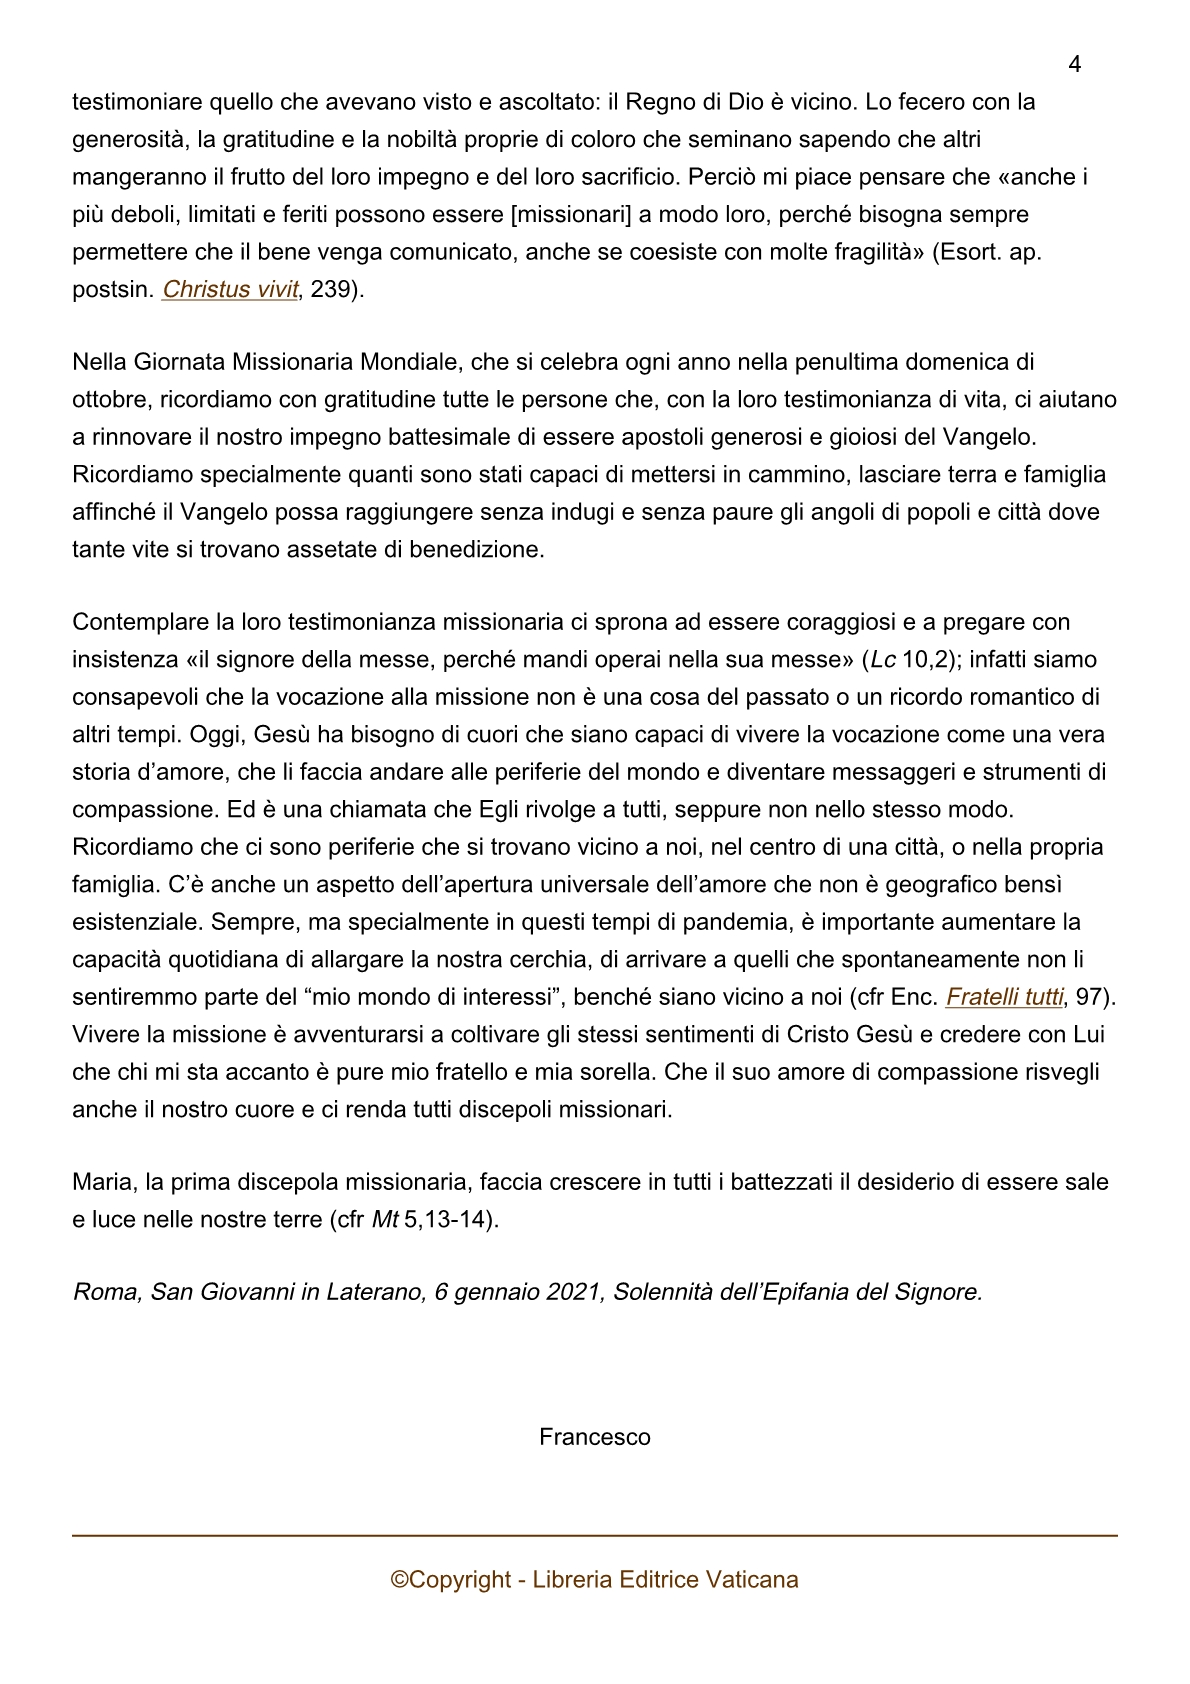 papa-francesco_20210106_giornata-missionaria20214